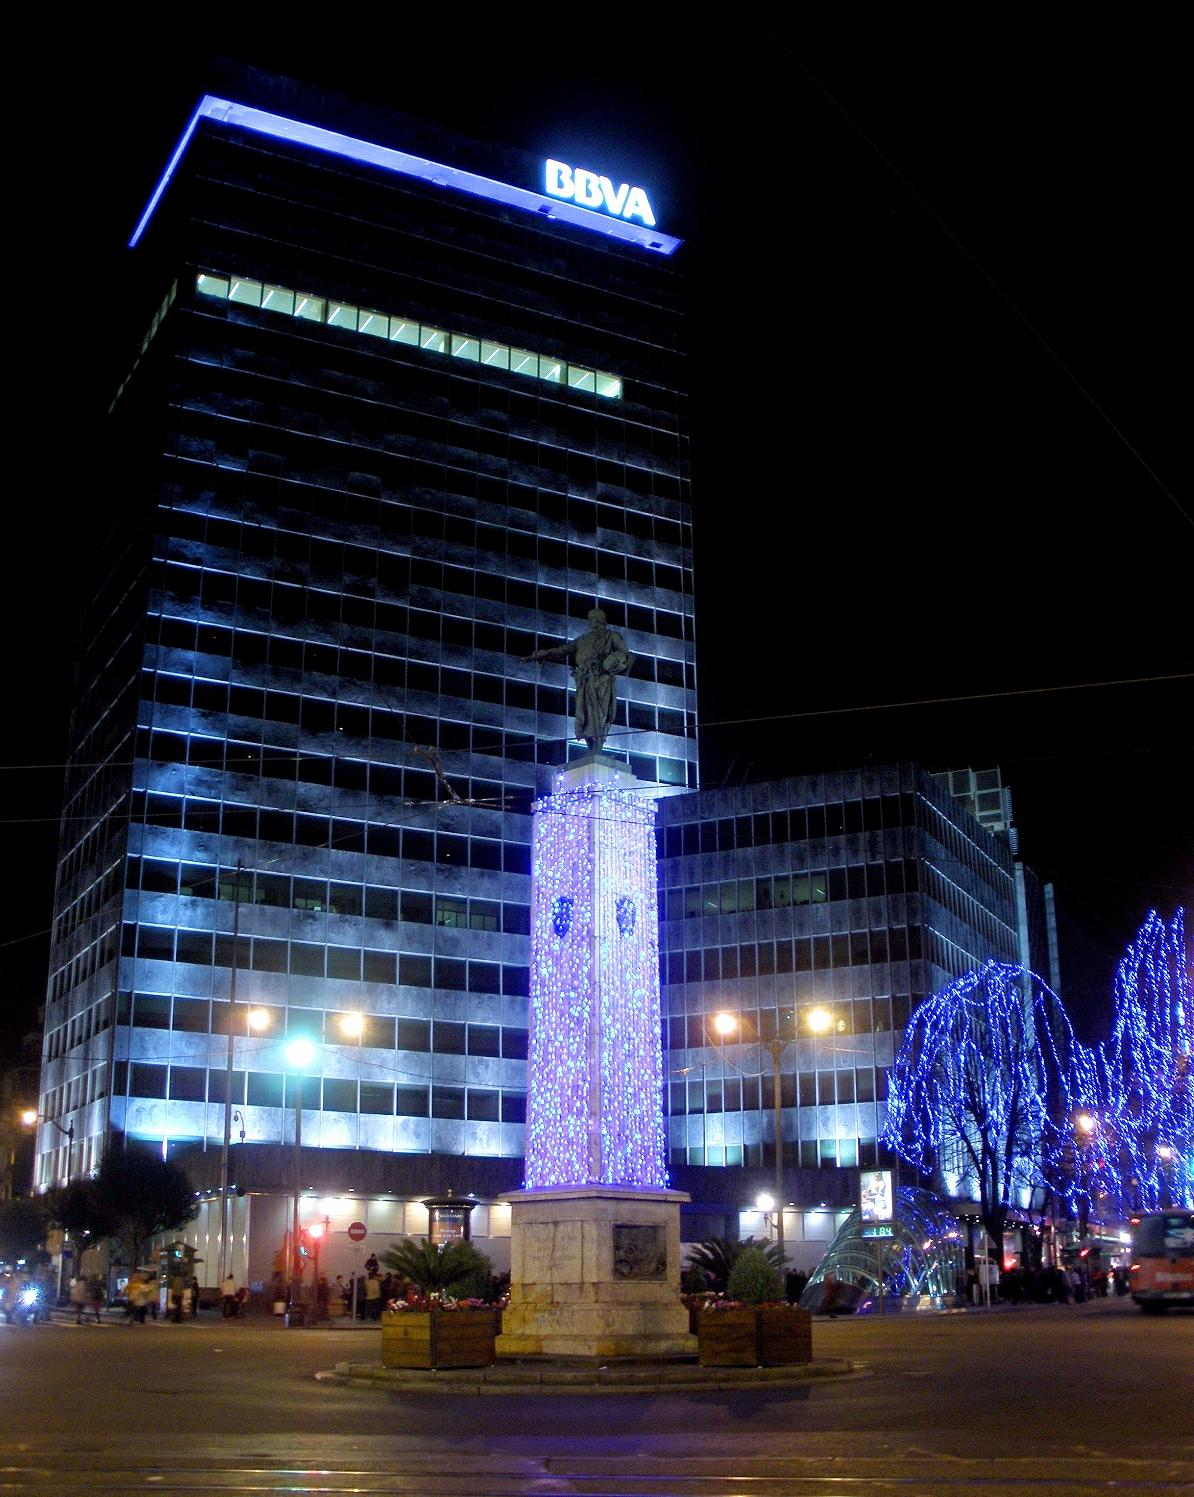 Banco bilbao vizcaya argentaria wikipedja wolna for Banco santander bilbao oficinas